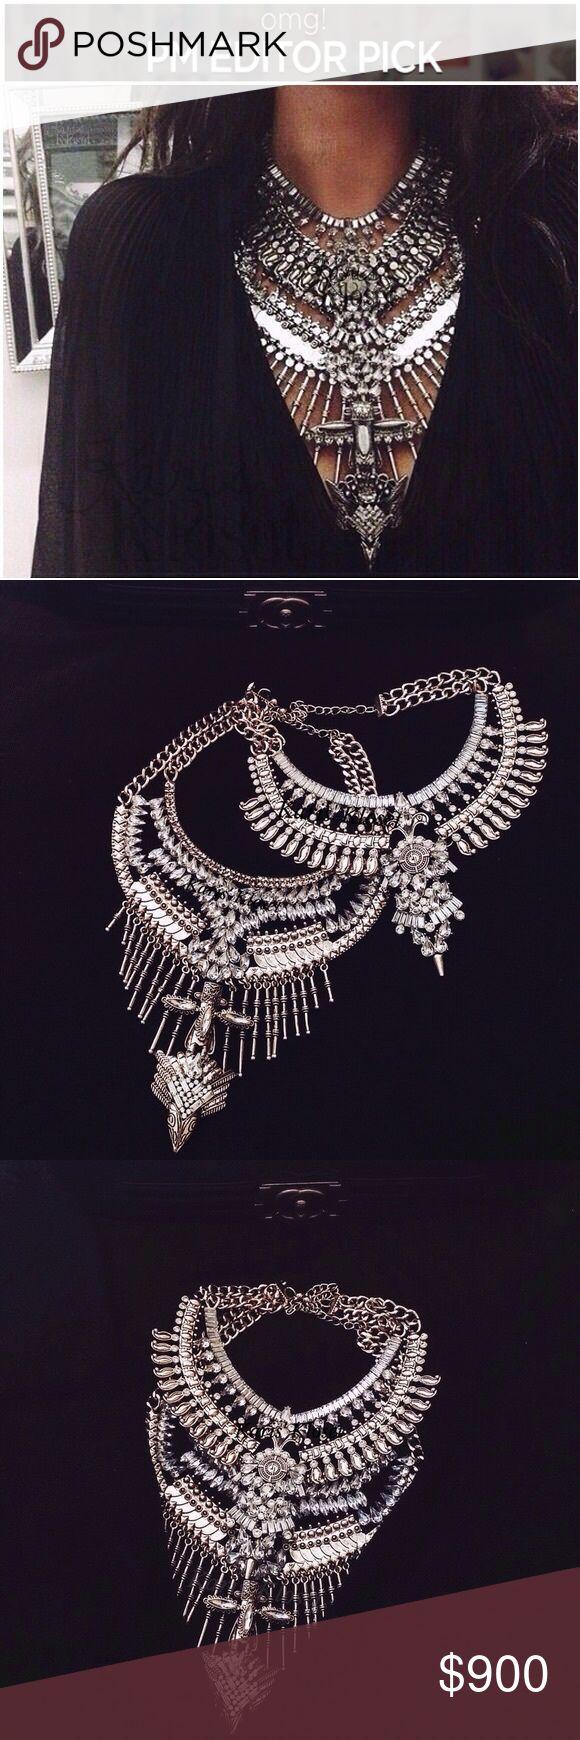 Spotted while shopping on Poshmark: Jewelry | Night's Edge Silver Statement necklace! #poshmark #fashion #shopping #style #Karis' Kloset #Jewelry